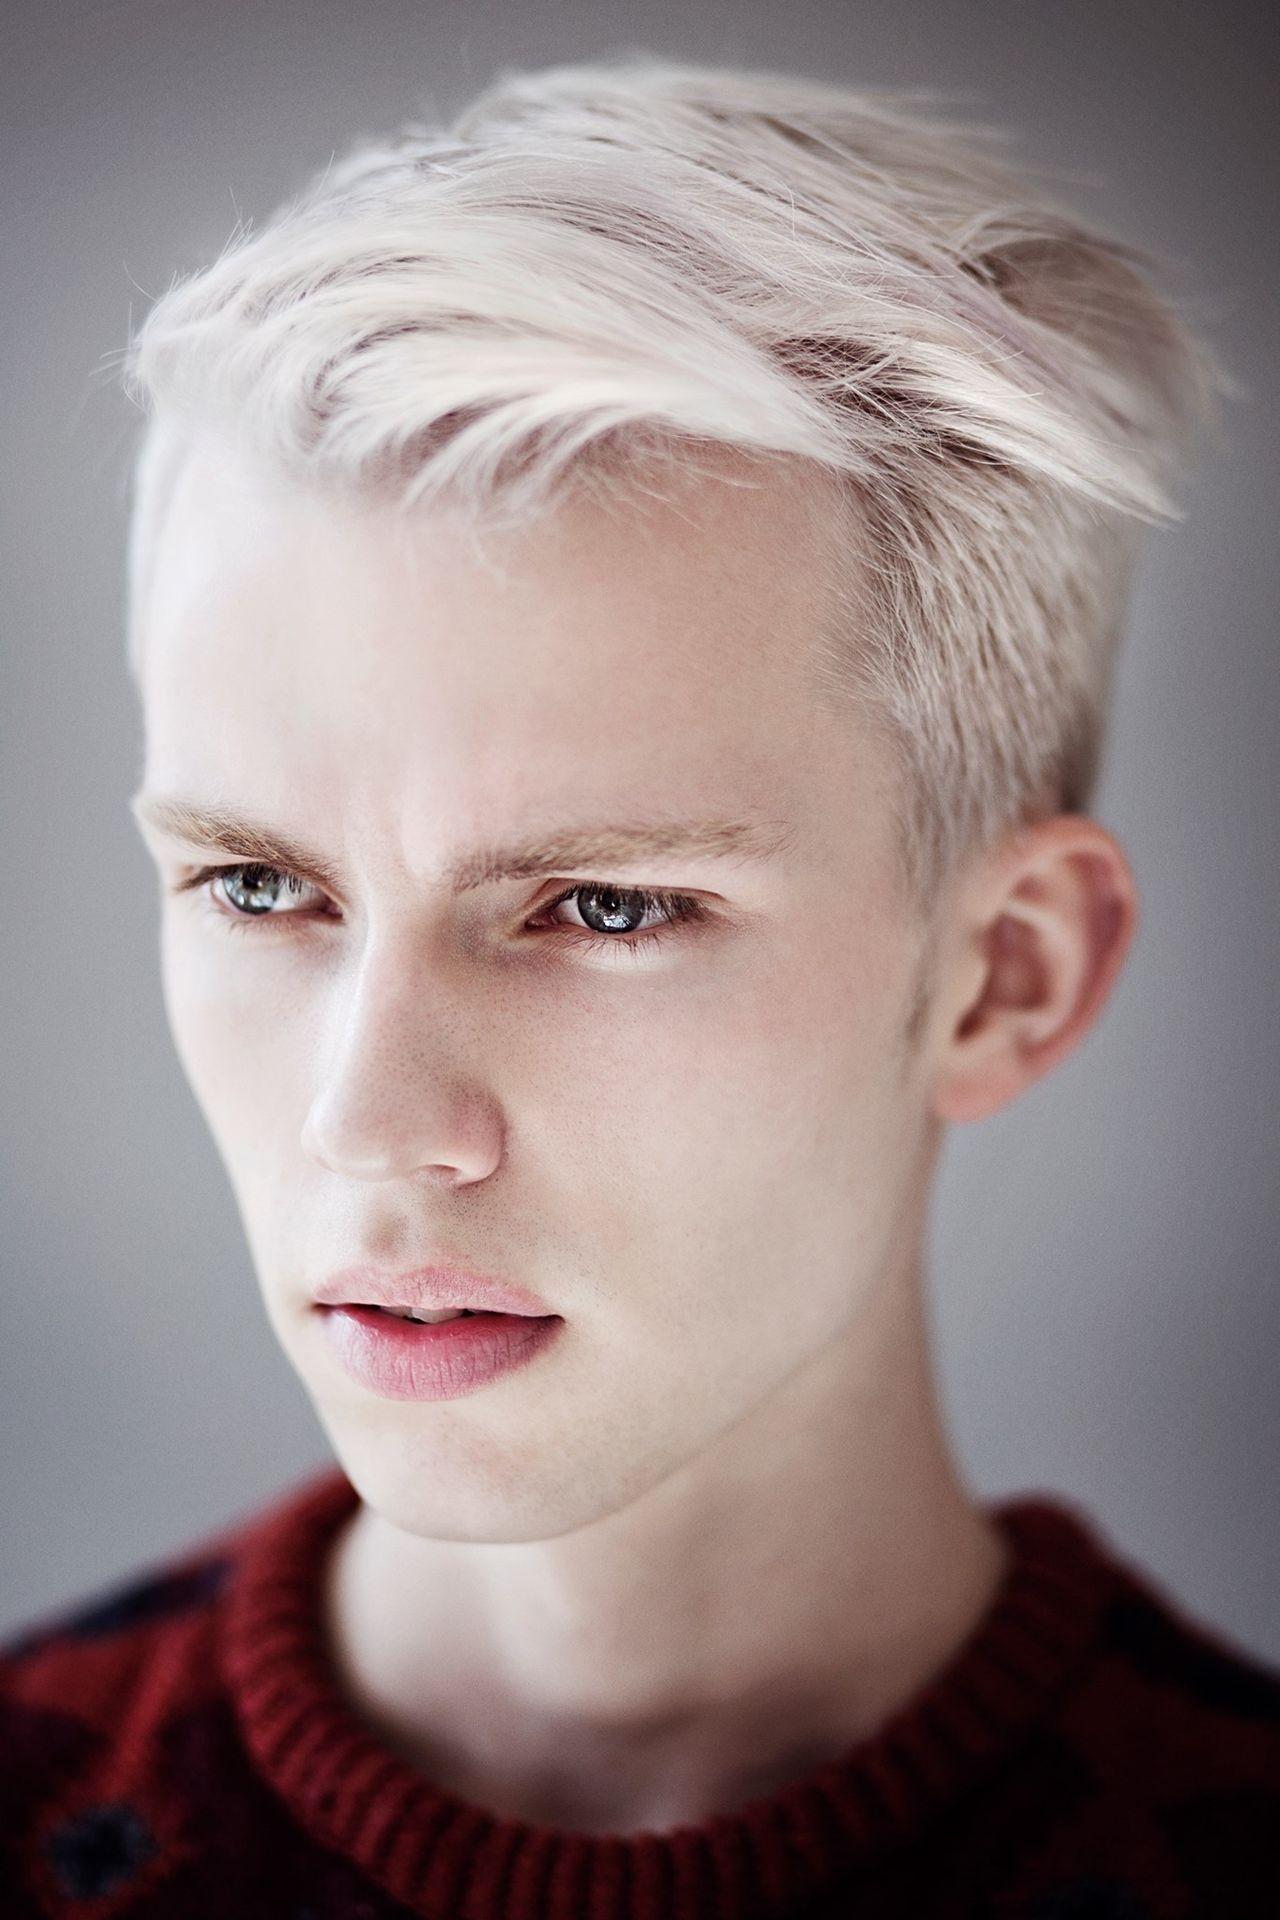 Chris Close S White Hair White Hair Men Platinum Blonde Hair Men Platinum Blonde Hair